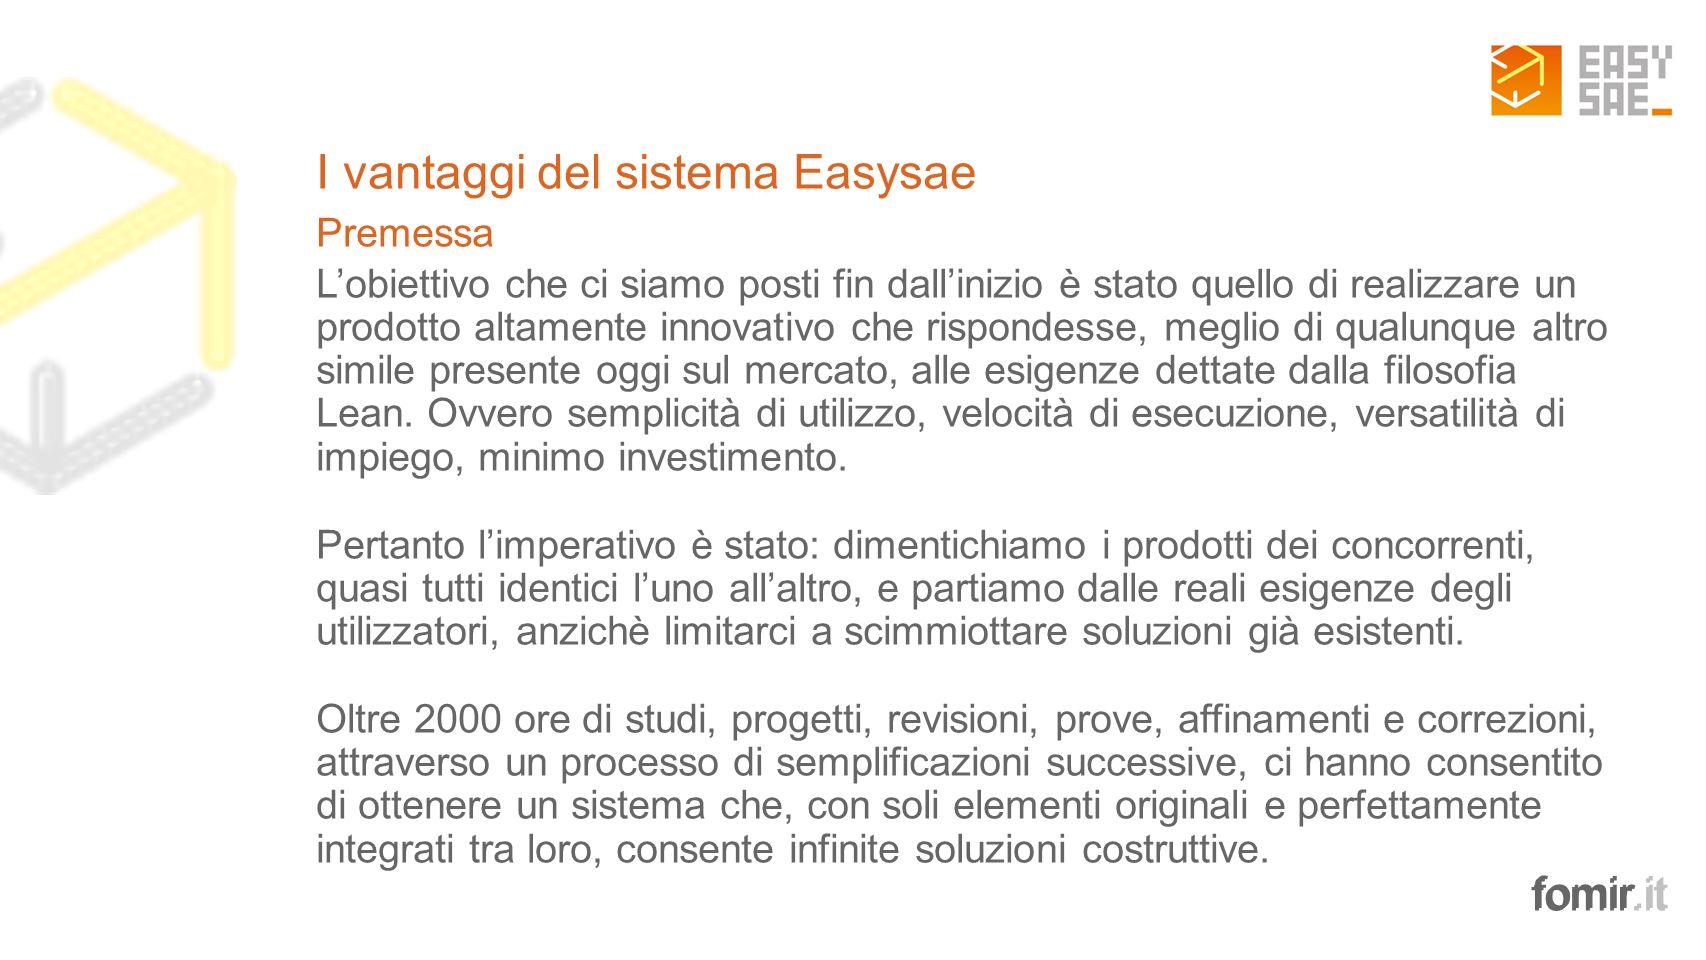 I vantaggi del sistema Easysae